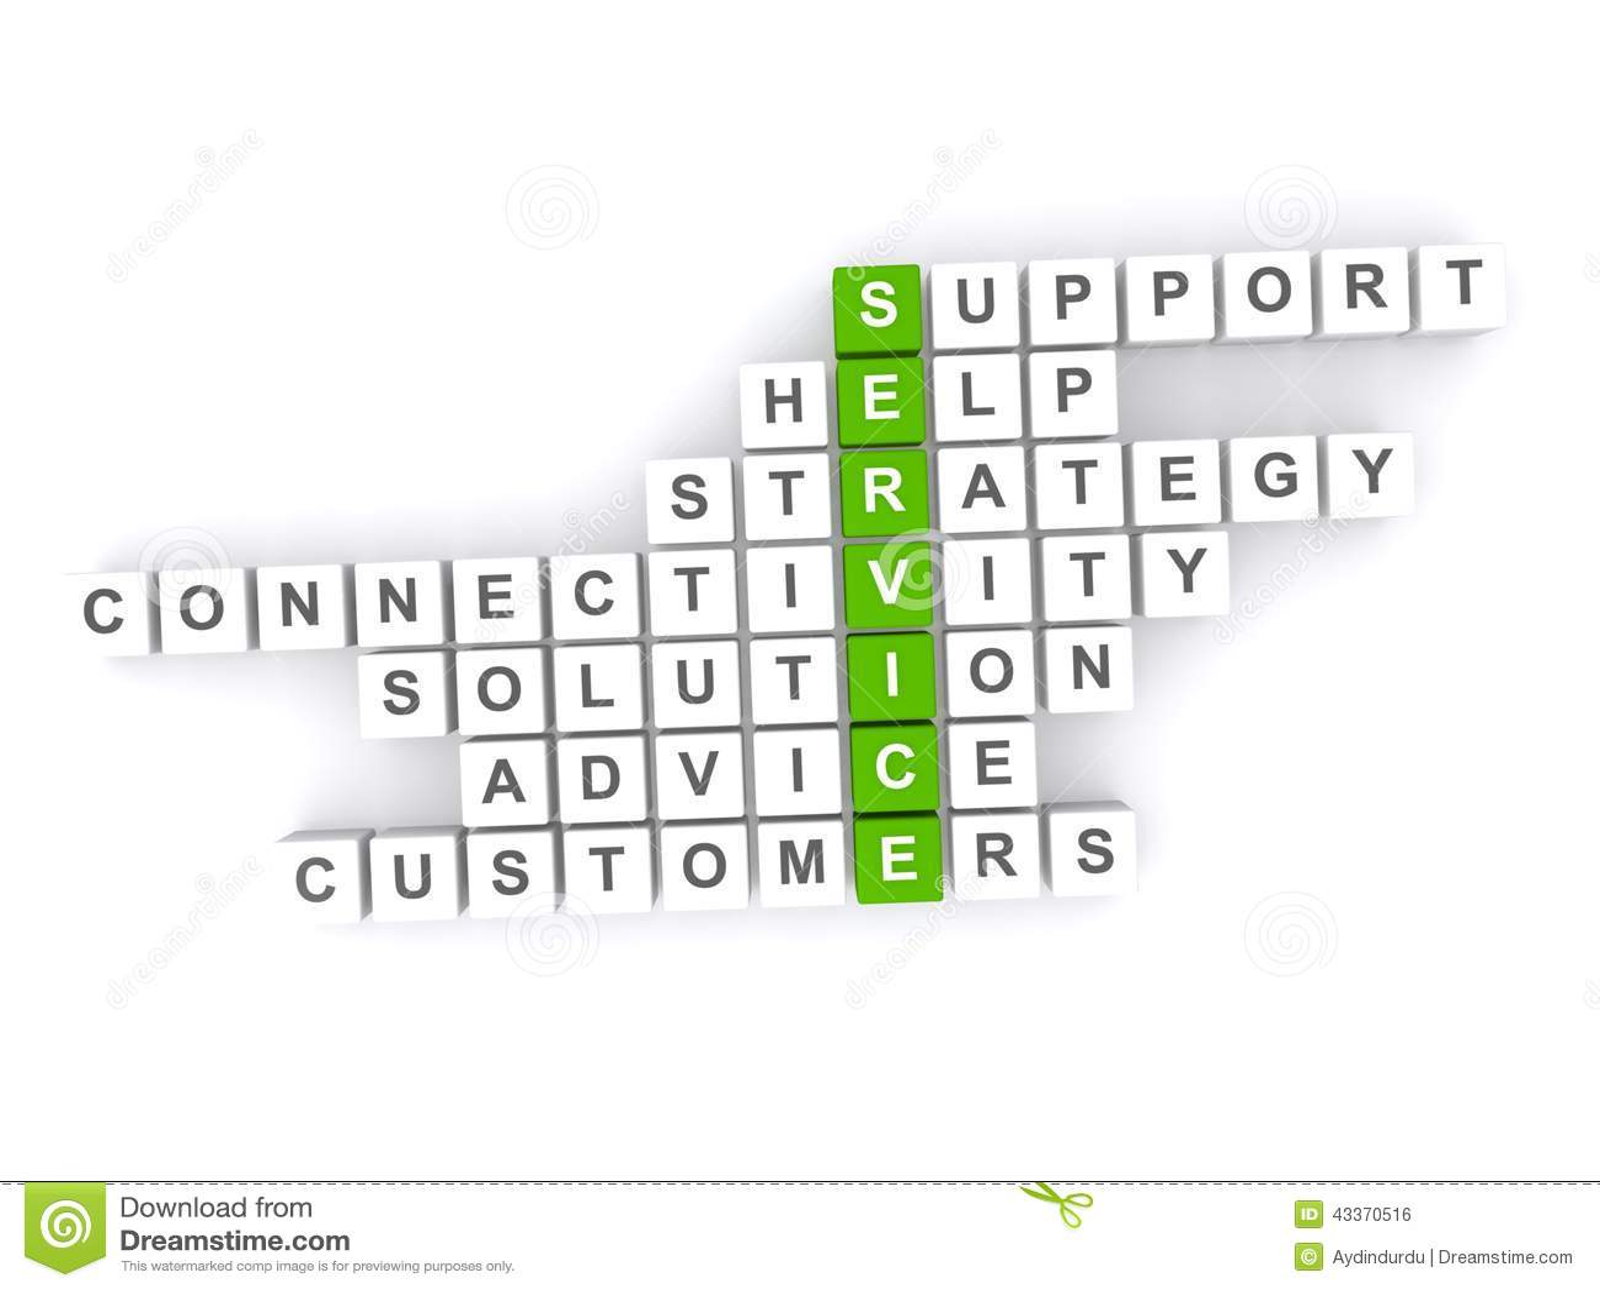 Help Support Advice Customer Service Crossword Stock